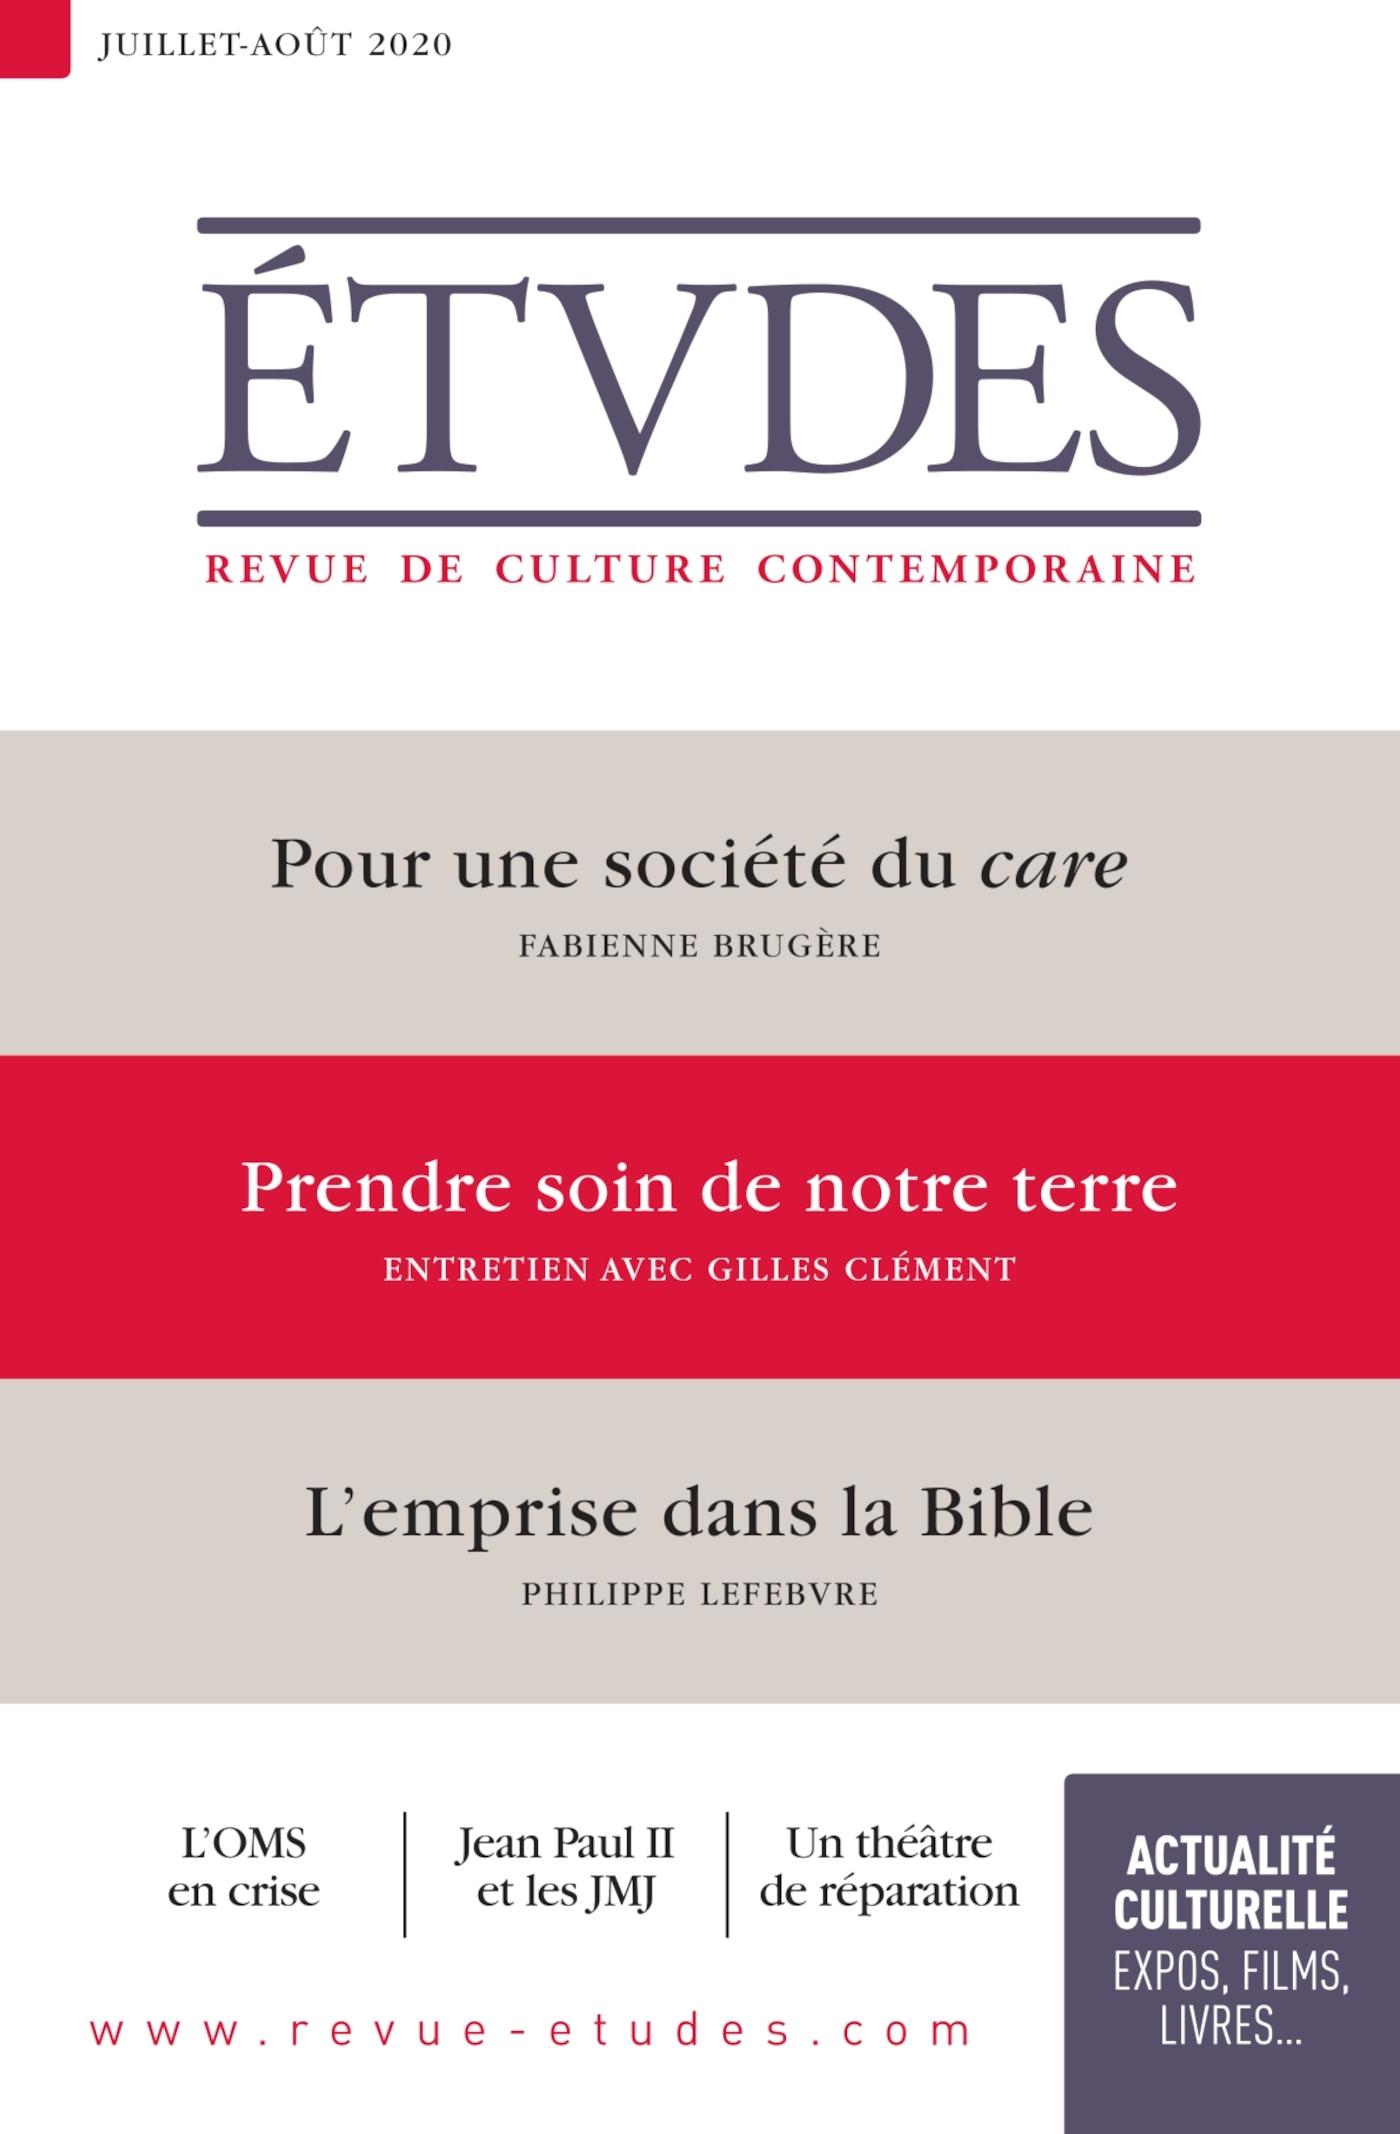 ETUDES 4273 - JUILLET